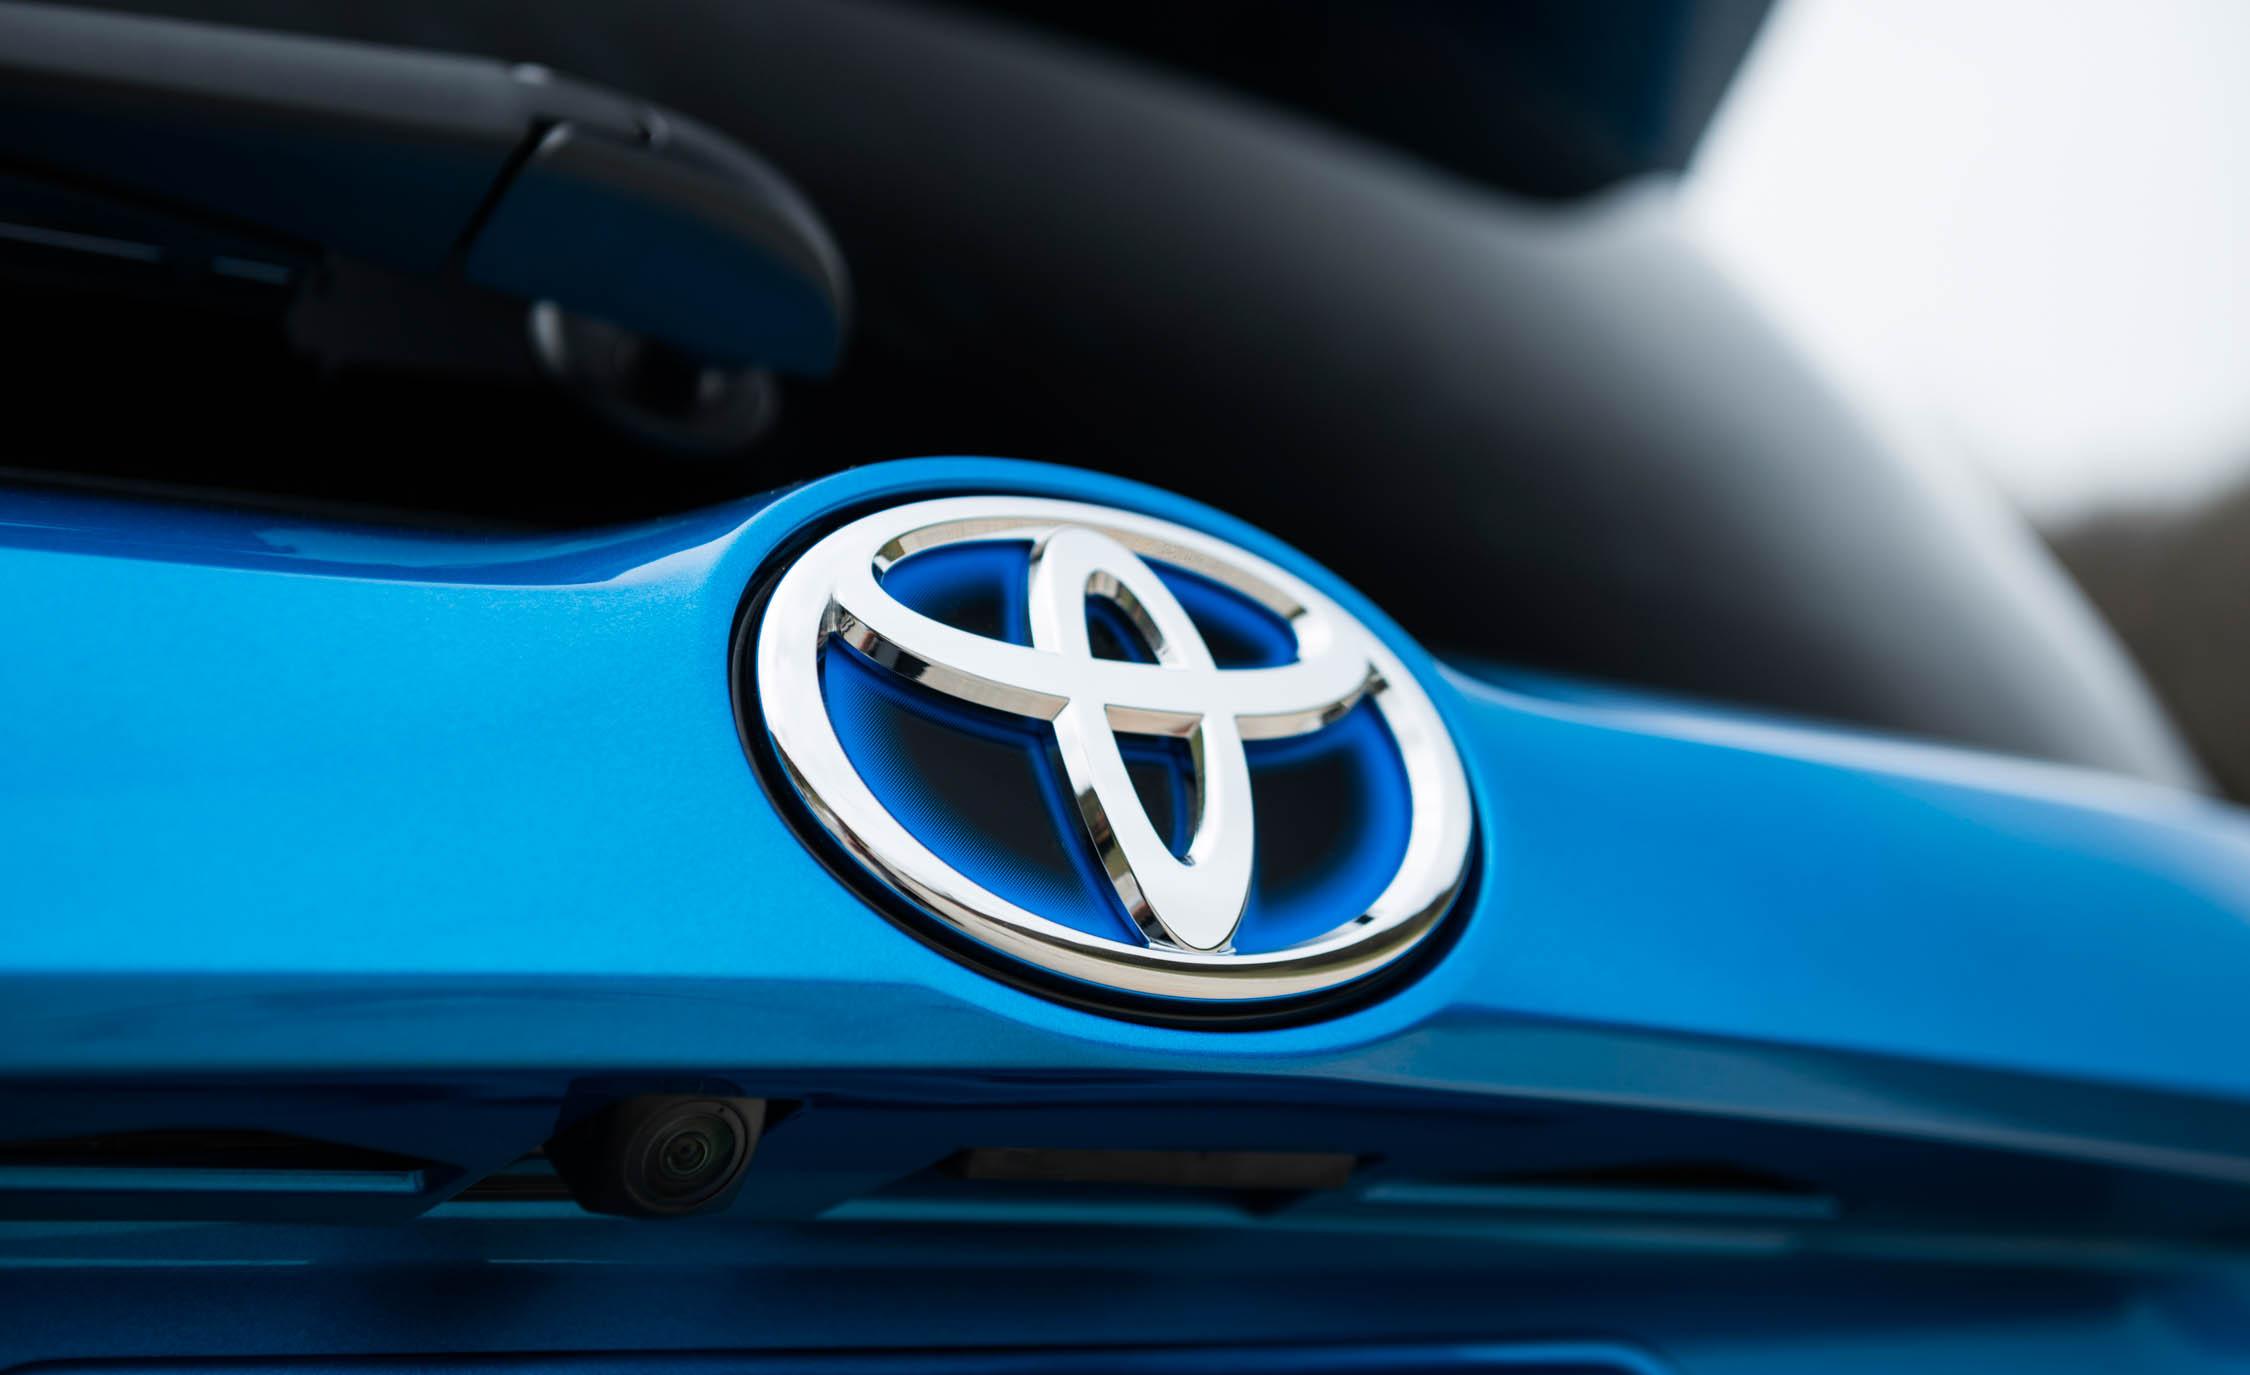 2016 Toyota RAV4 Hybrid Exterior Rear Badge